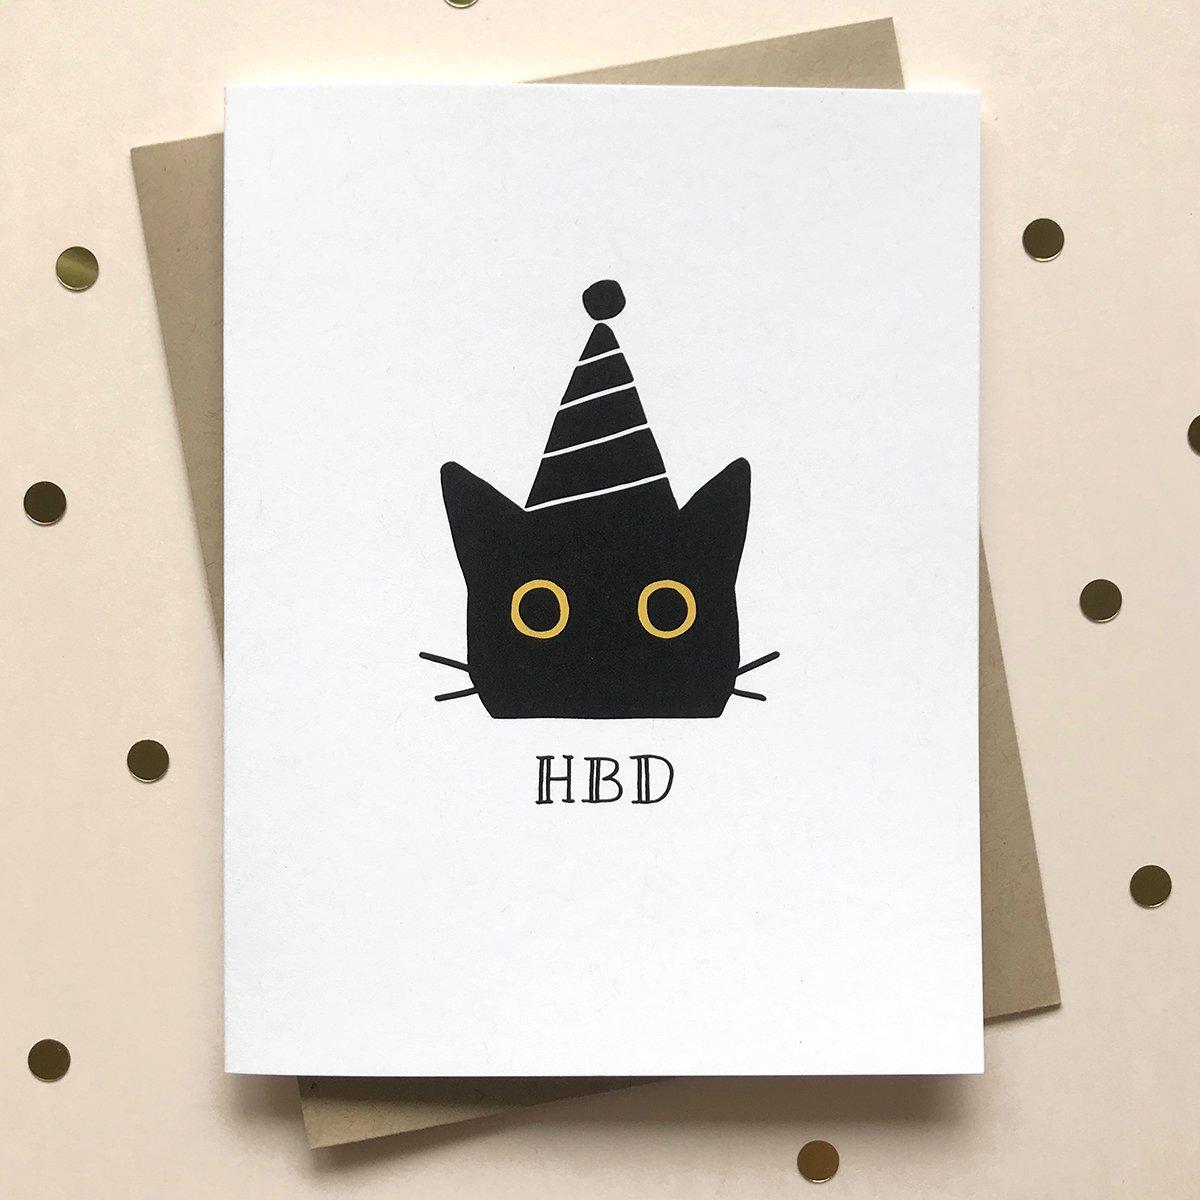 Hbd Cat Birthday Card In 2021 Cat Birthday Card Cat Birthday Cards Funny Funny Birthday Cards